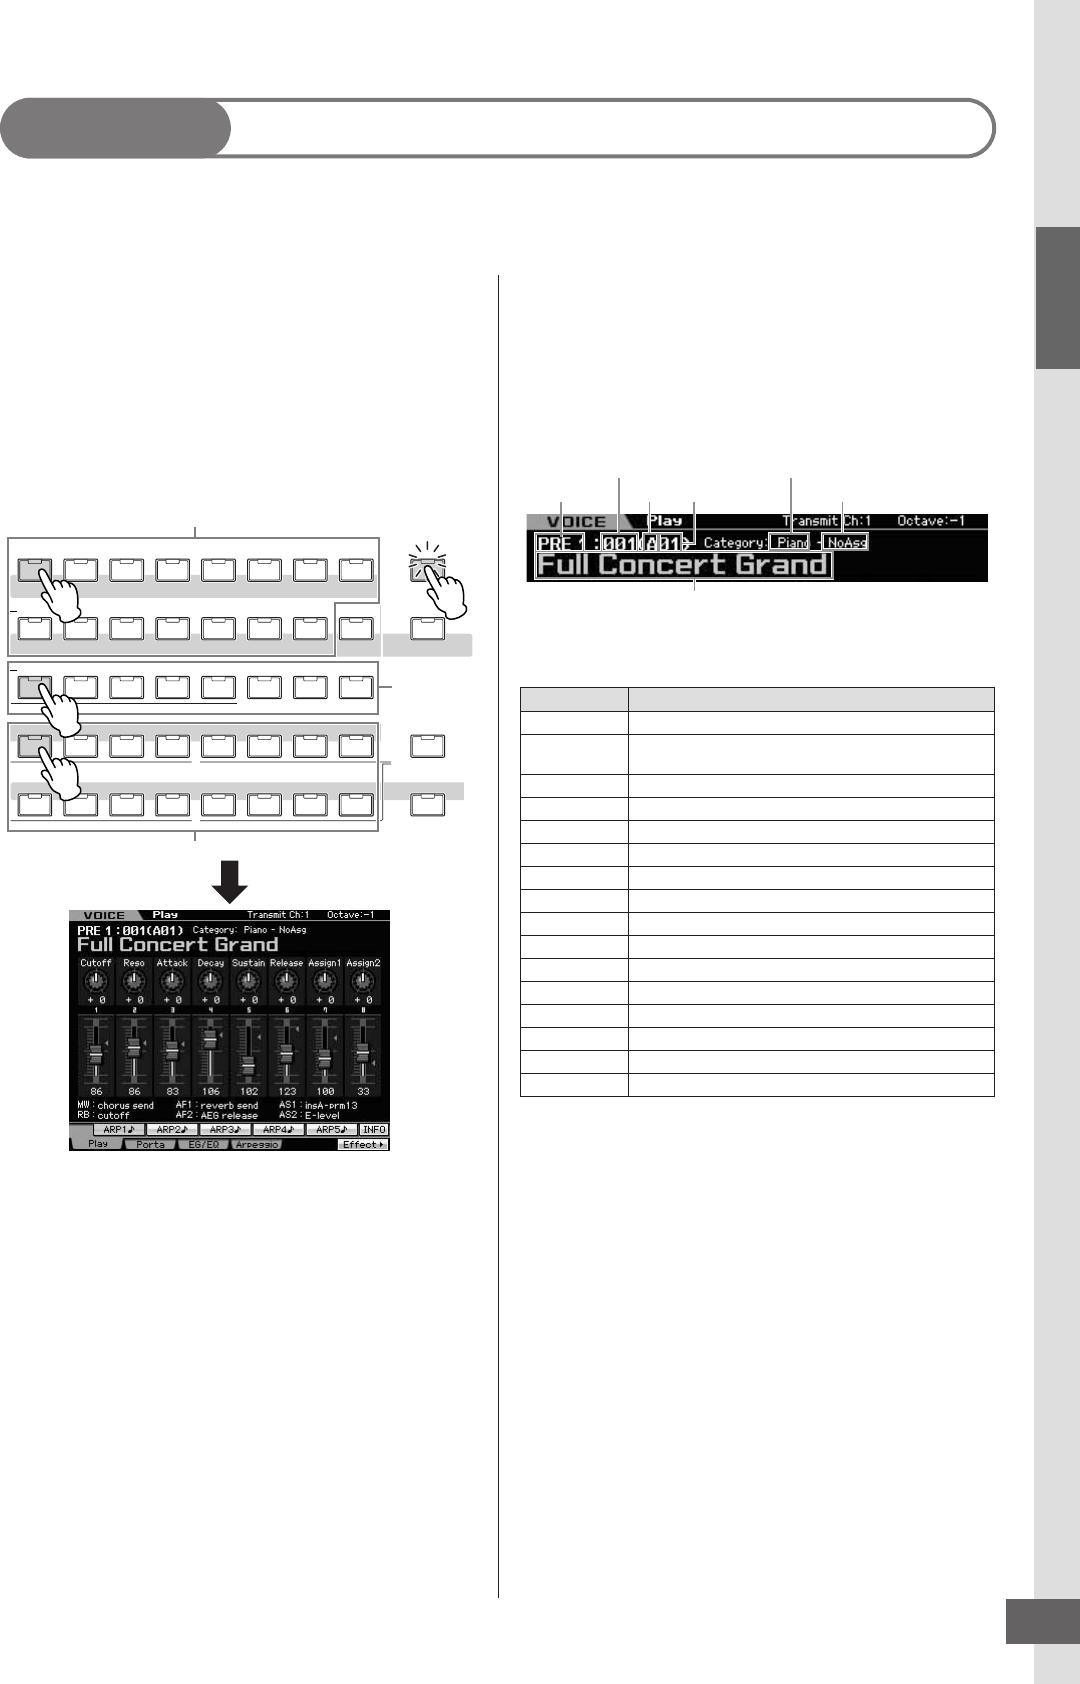 Yamaha MOTIF XS Owner's Manual XS6/MOTIF XS7/MOTIF XS8